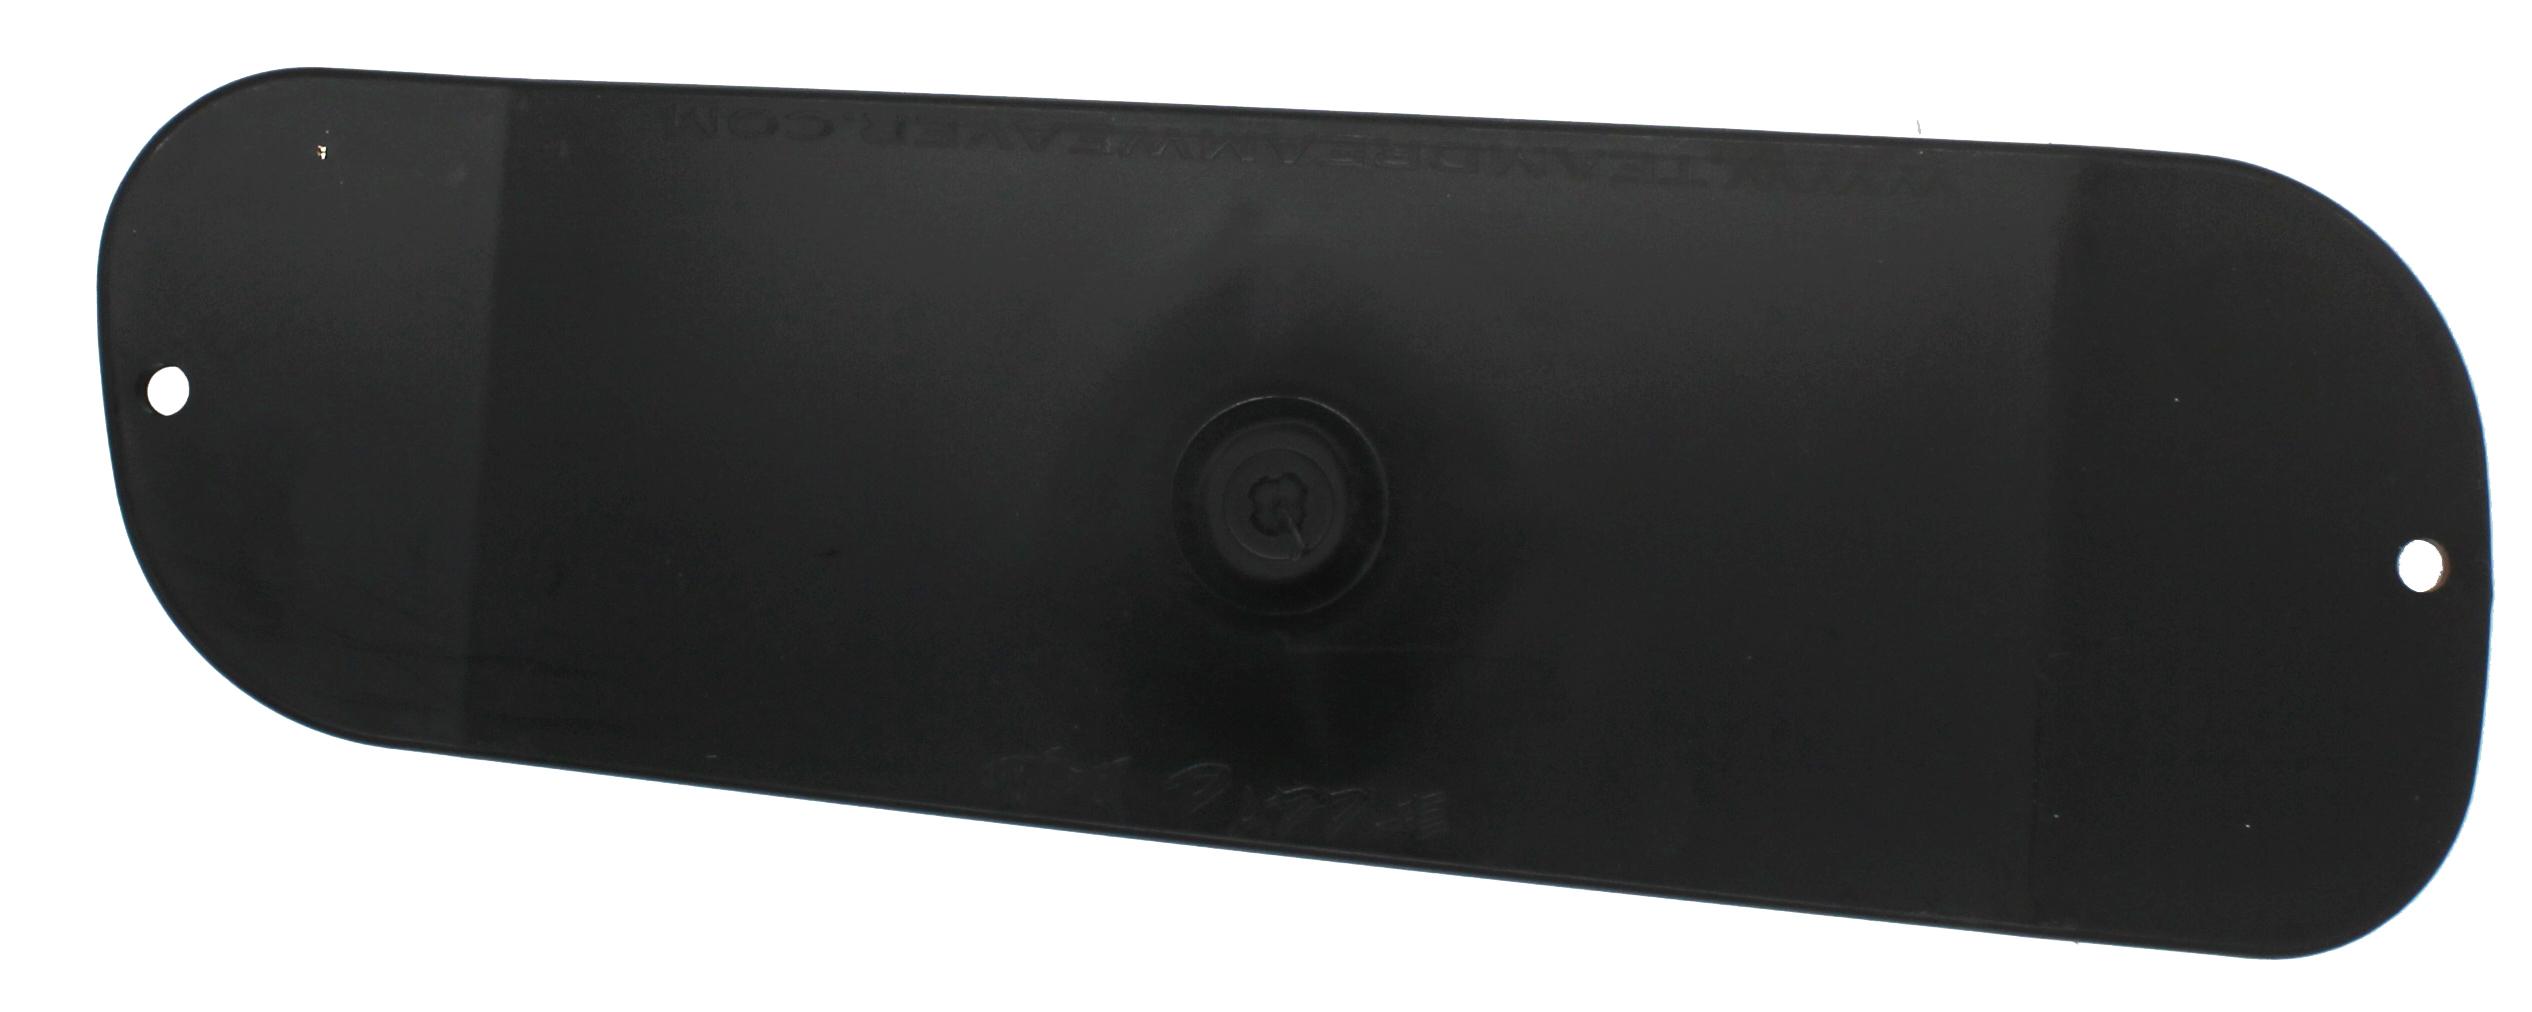 Paddle 11 – Black/Chrome